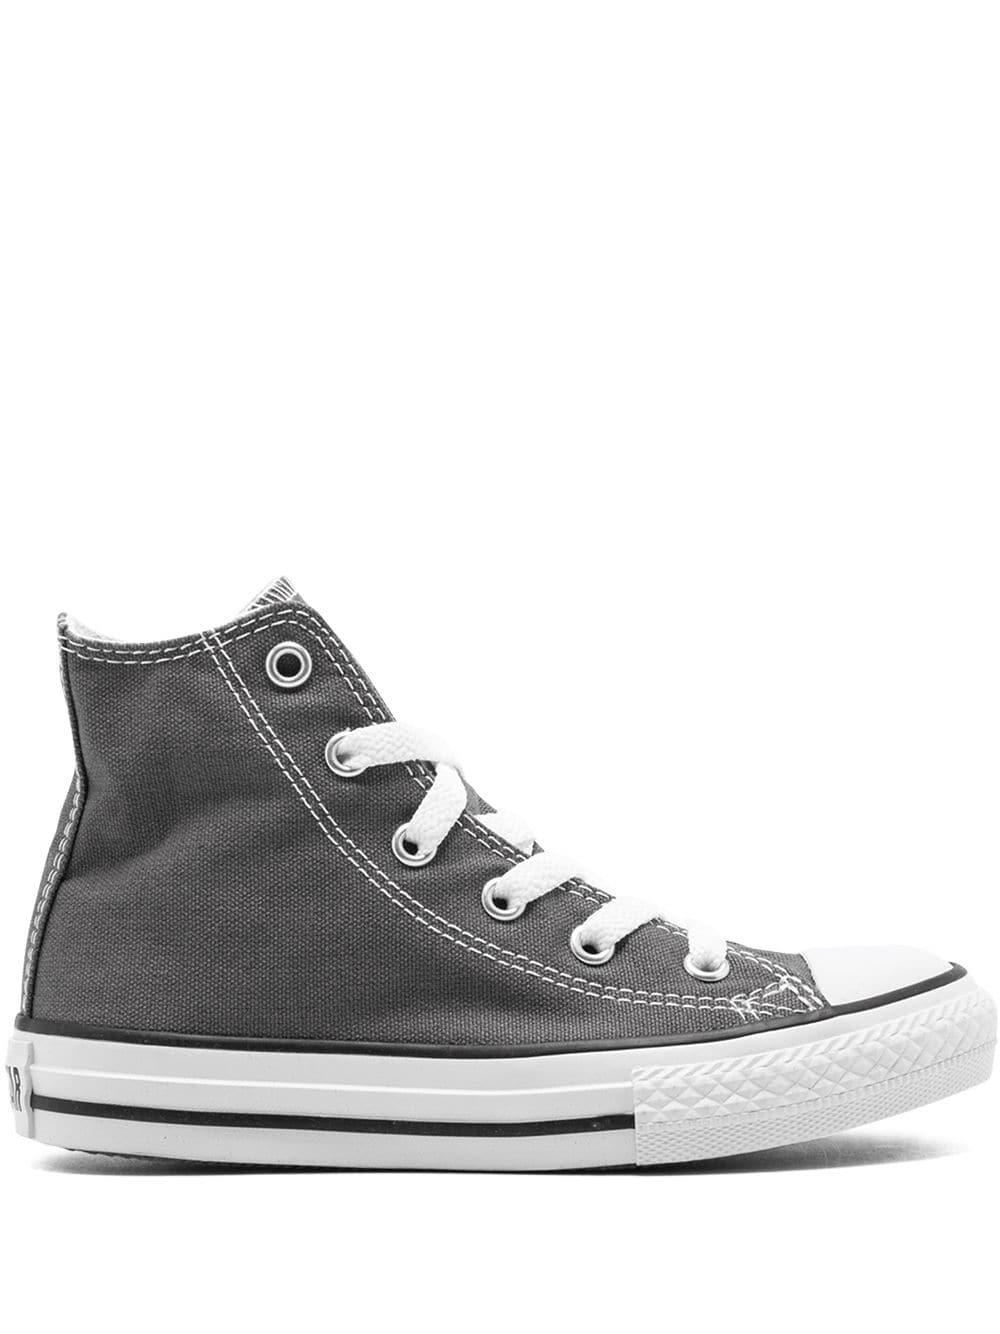 Converse CT AS SP YTH HI sneakers Grey in 2020 | Sneakers